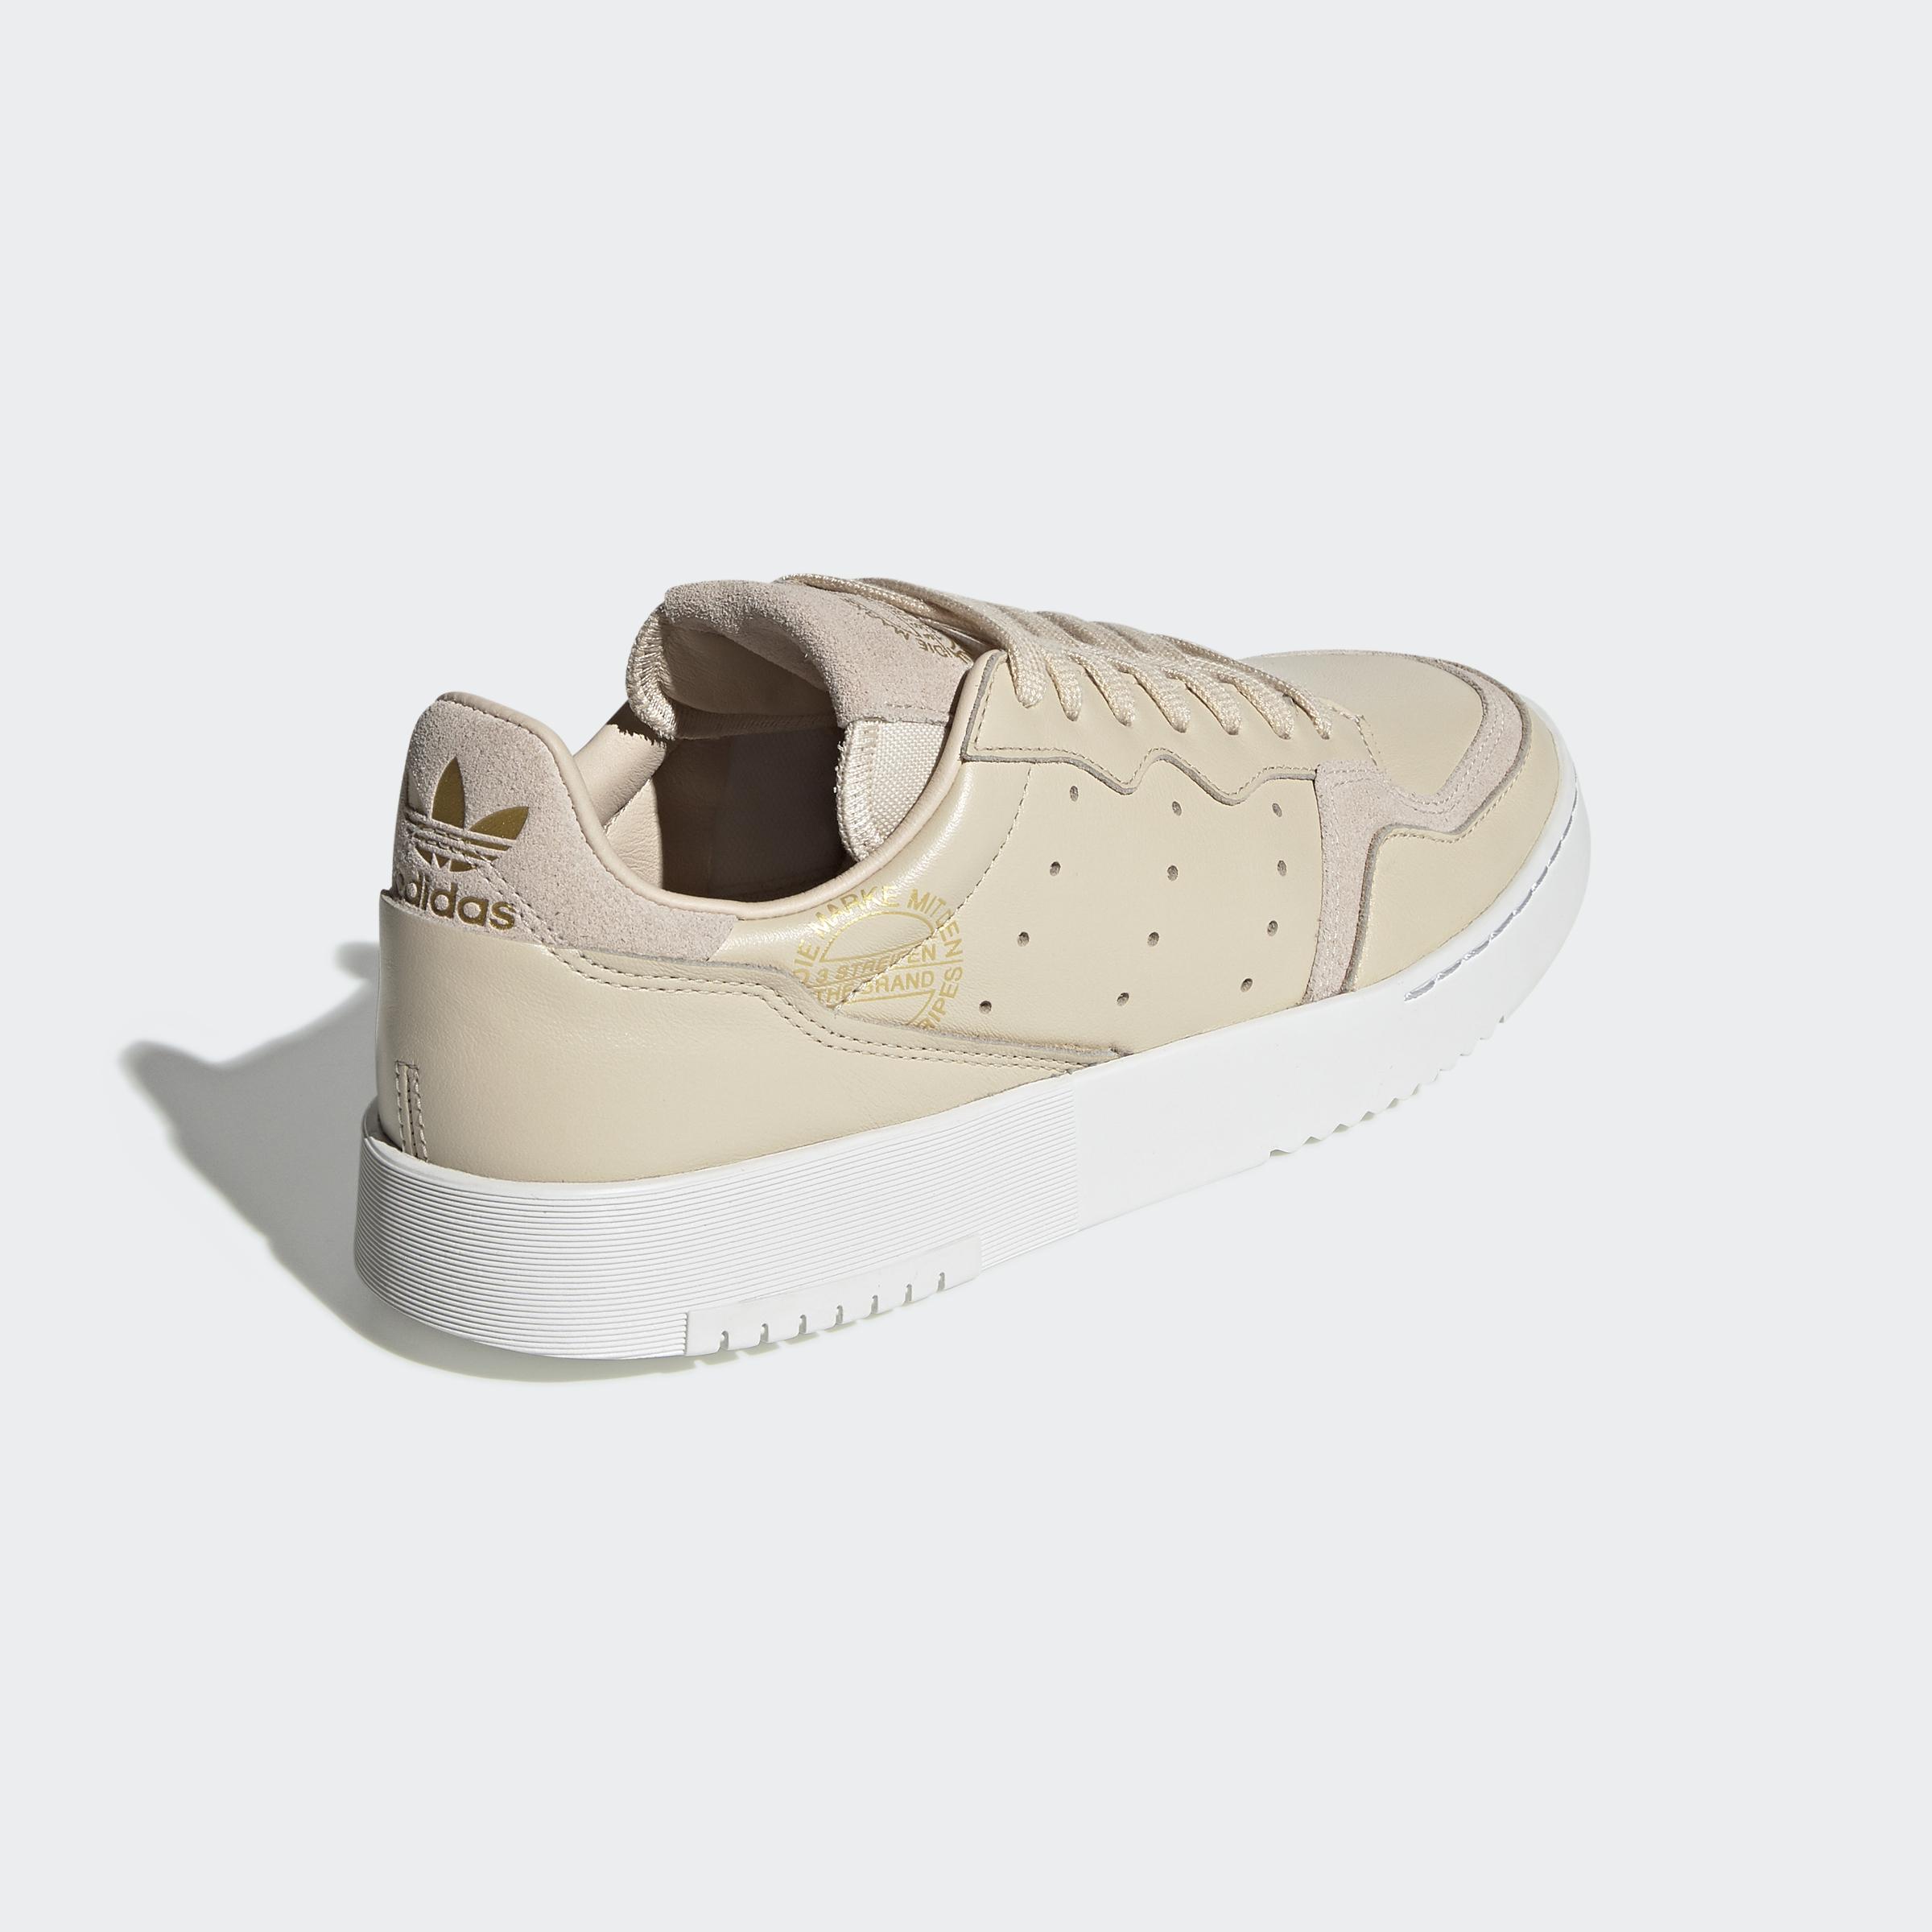 Indexbild 8 - adidas Originals Supercourt Schuh Herren, Damen Sneakers Turnschuhe  Freizeit